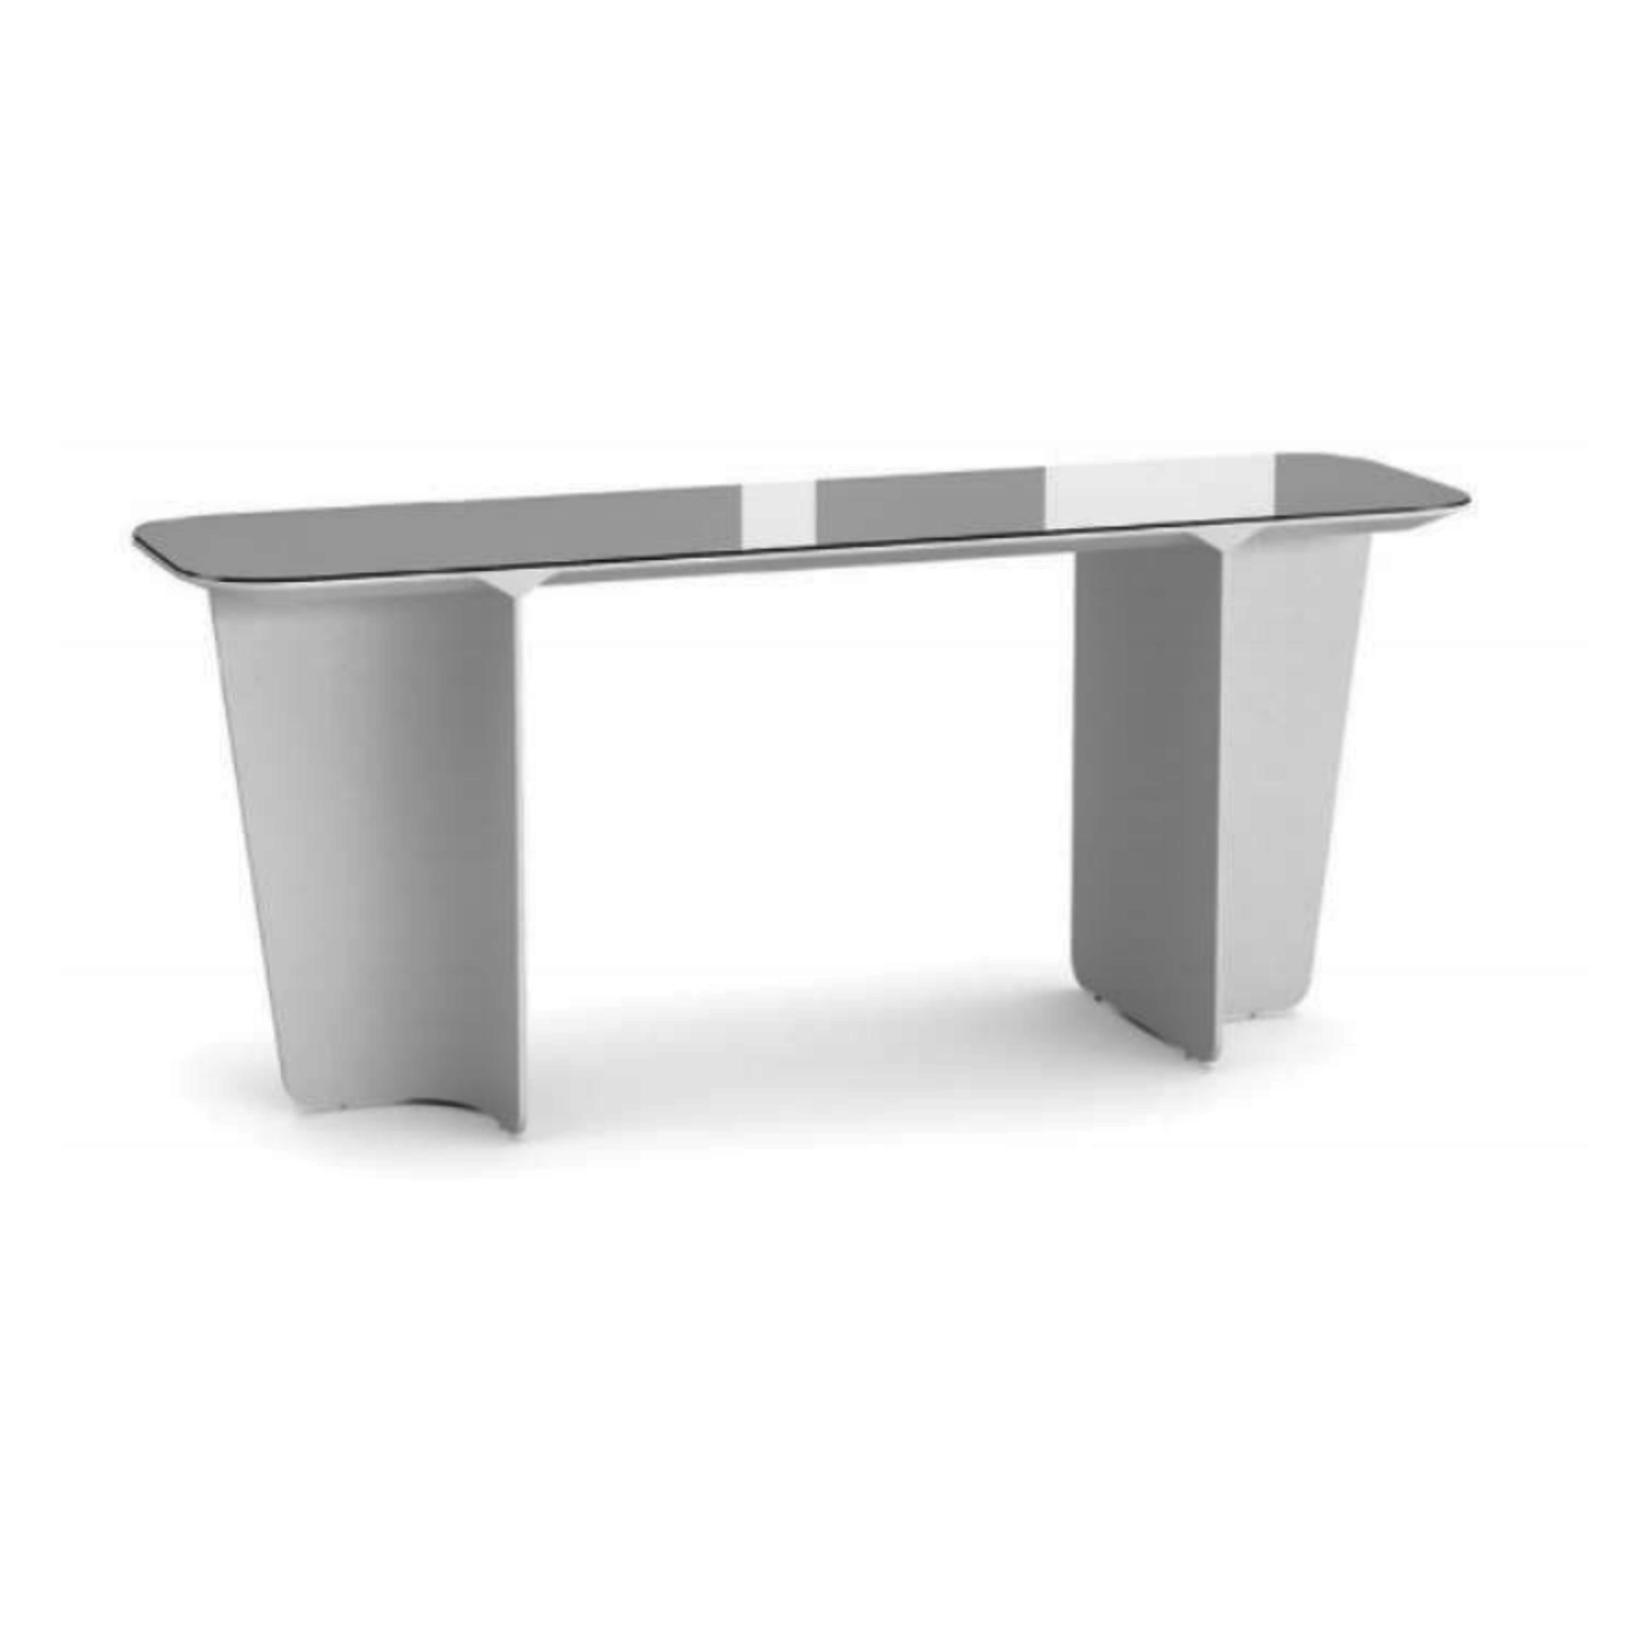 Harmony Studio Adagio Console Table